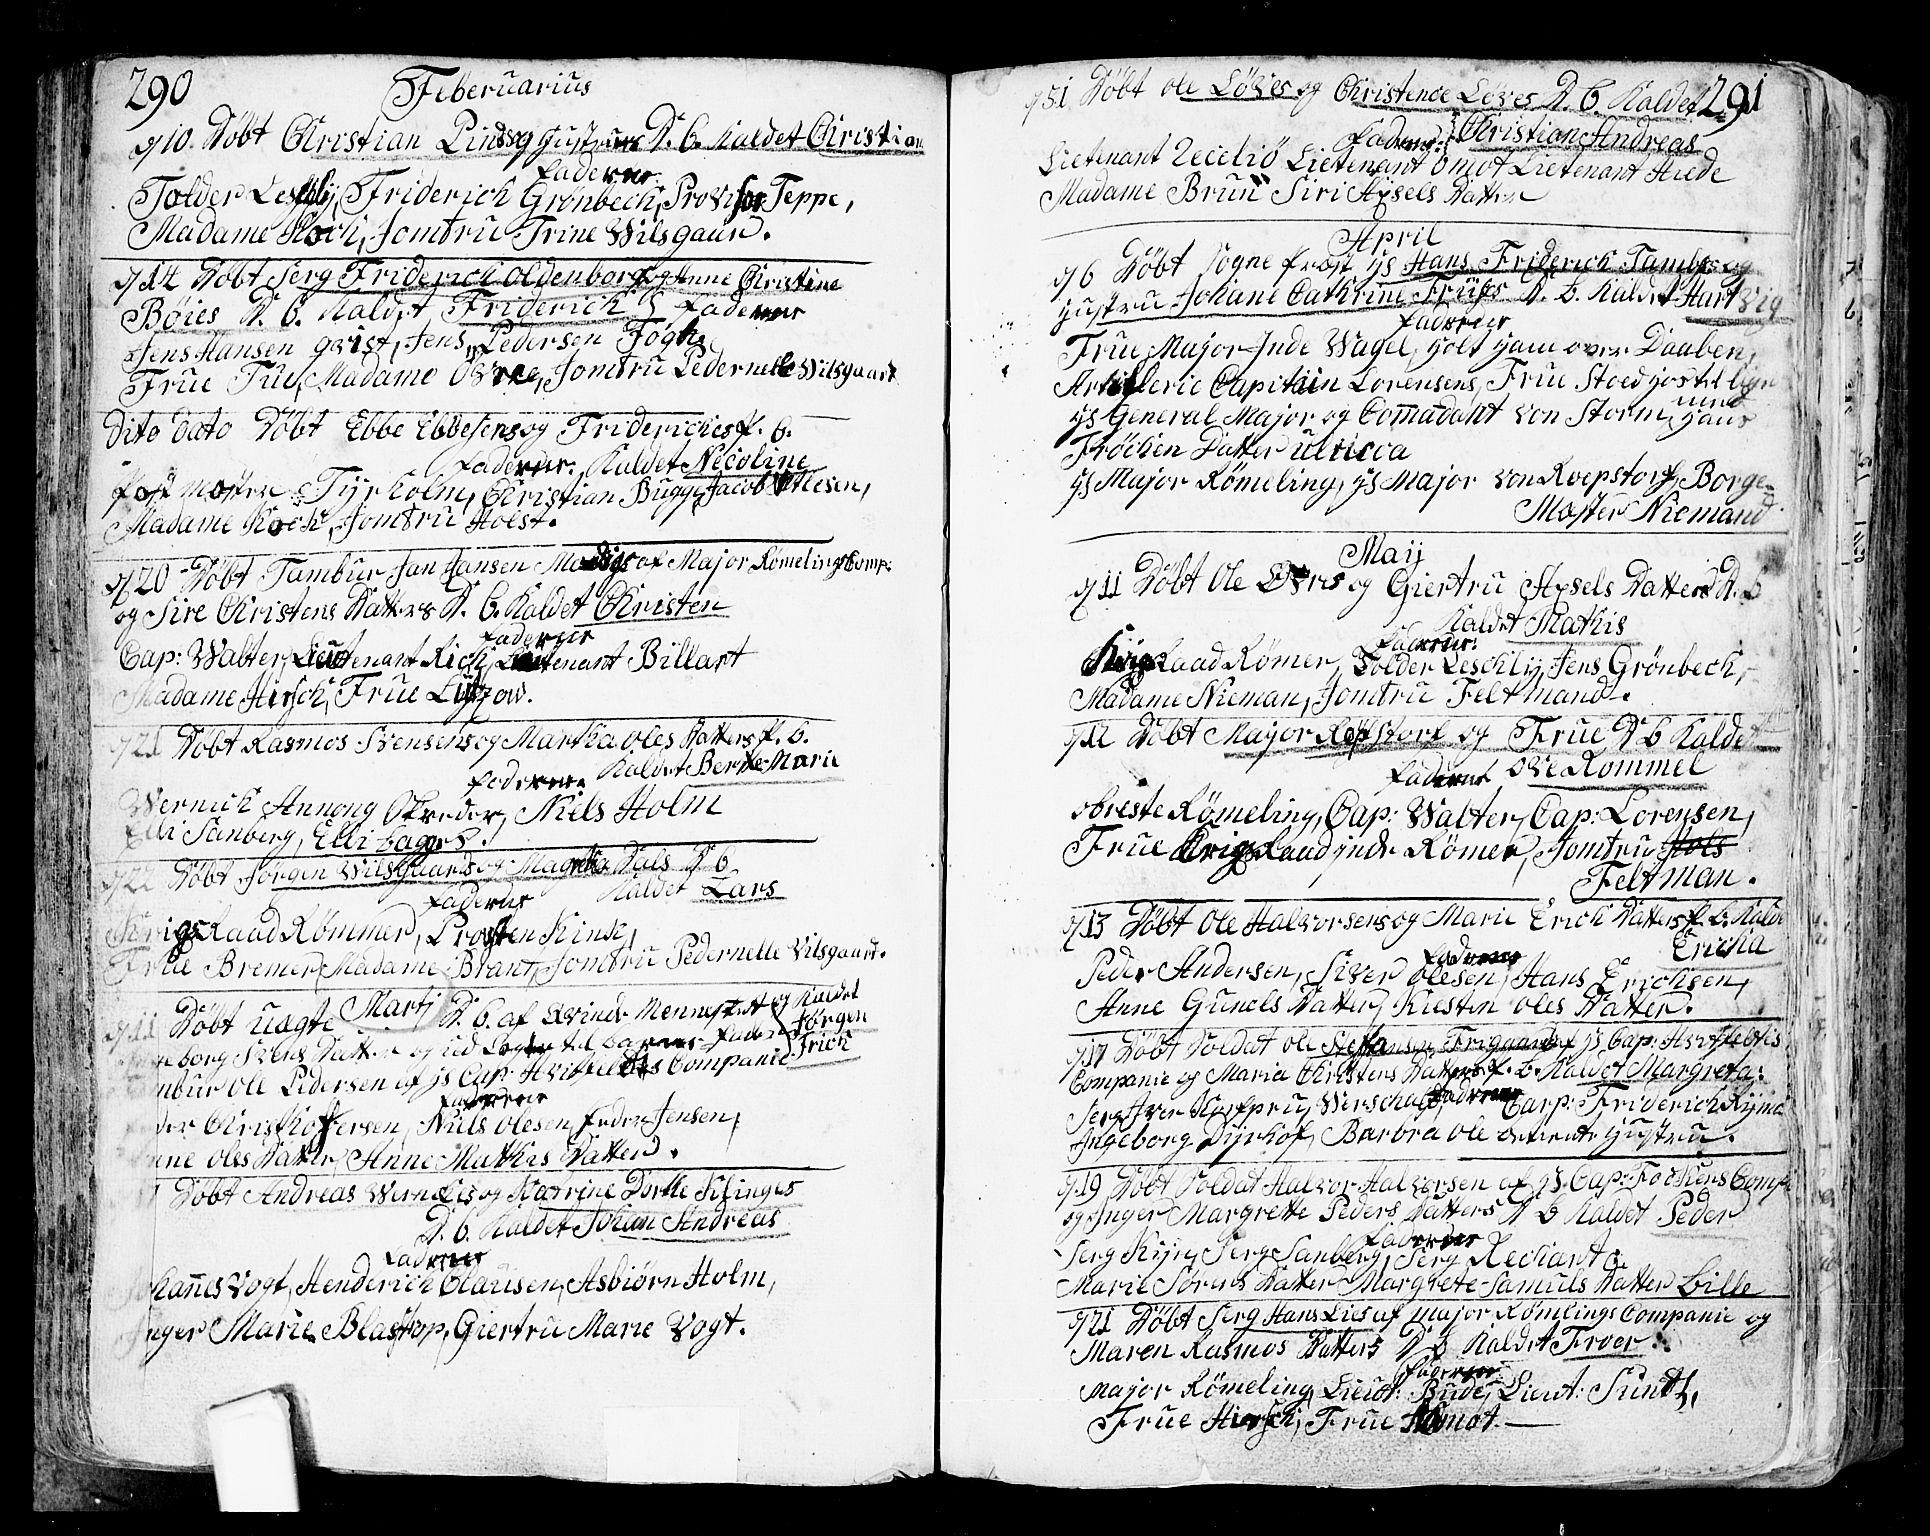 SAO, Fredrikstad prestekontor Kirkebøker, F/Fa/L0002: Ministerialbok nr. 2, 1750-1804, s. 290-291